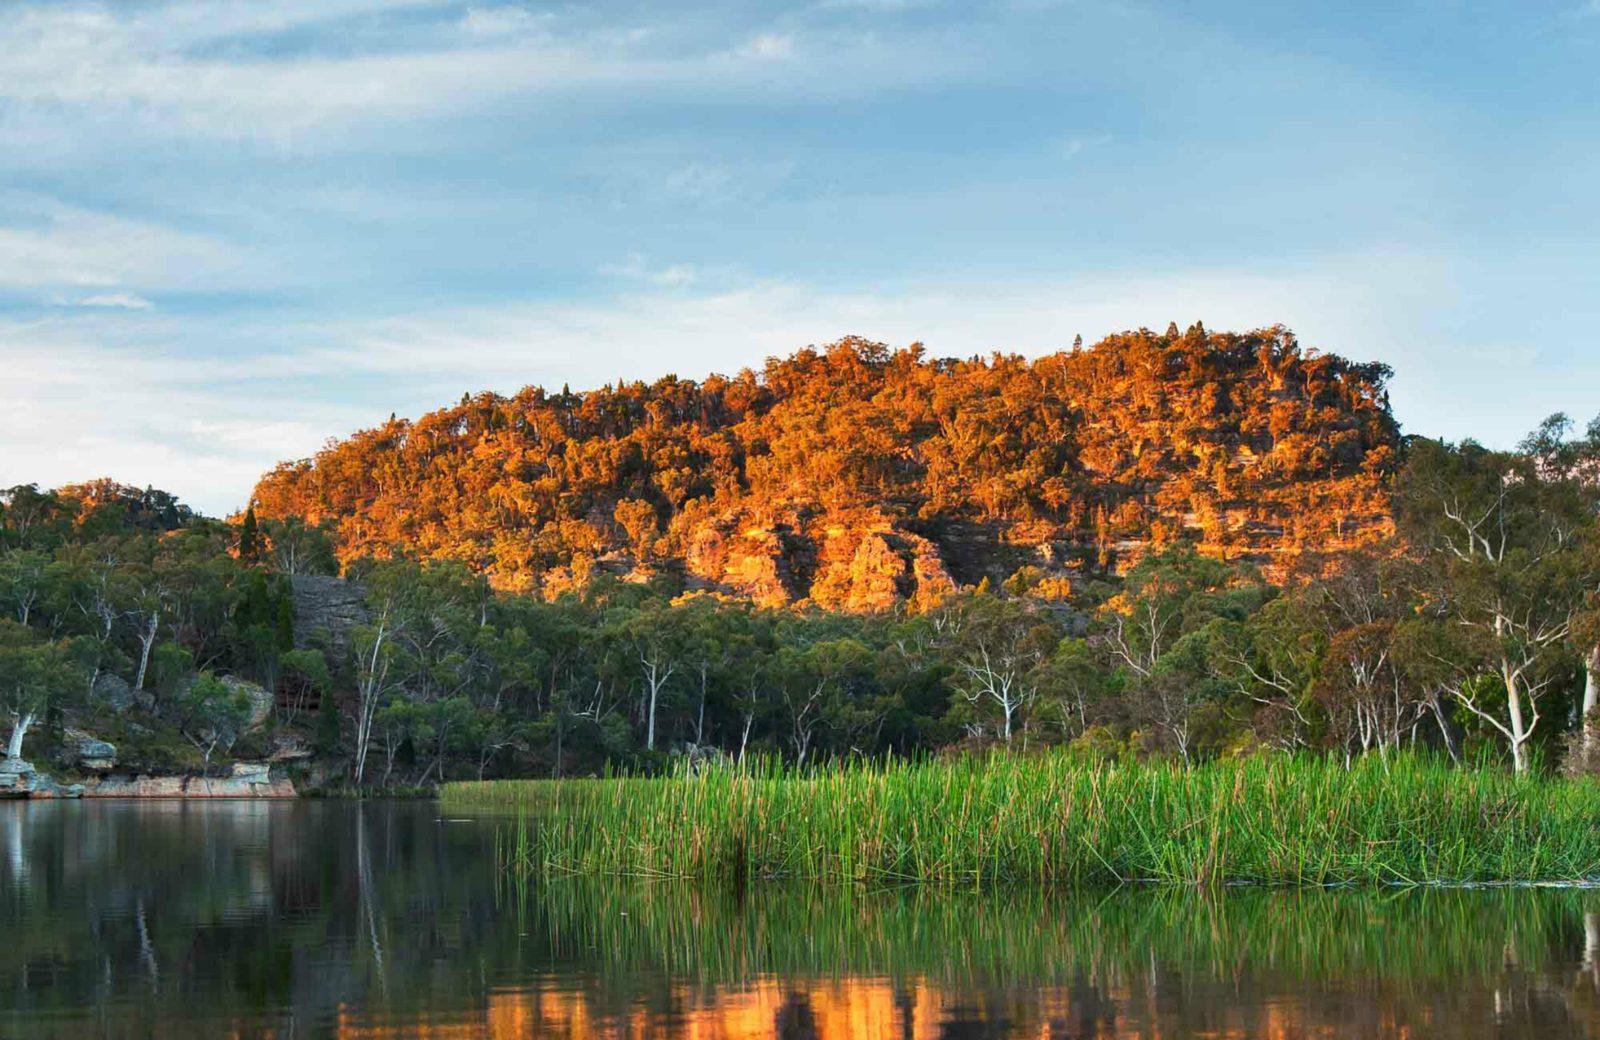 Dunns Swamp - Ganguddy campground, Wollemi National Park. Photo: Ingo Oeland